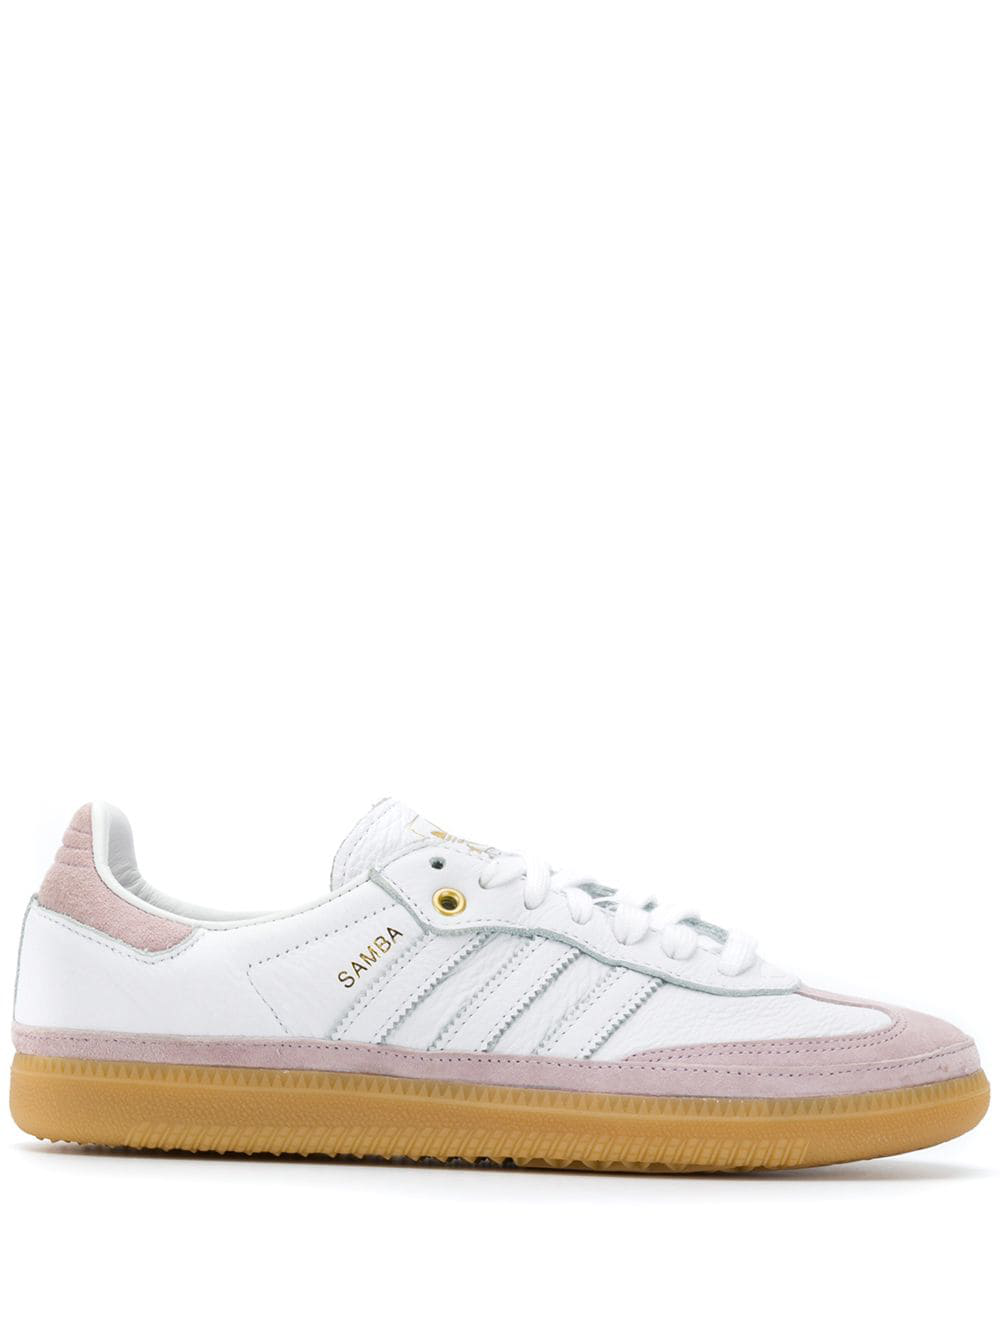 finest selection 280e1 c2dad Adidas Originals Adidas Samba Sneakers - Farfetch In Pink